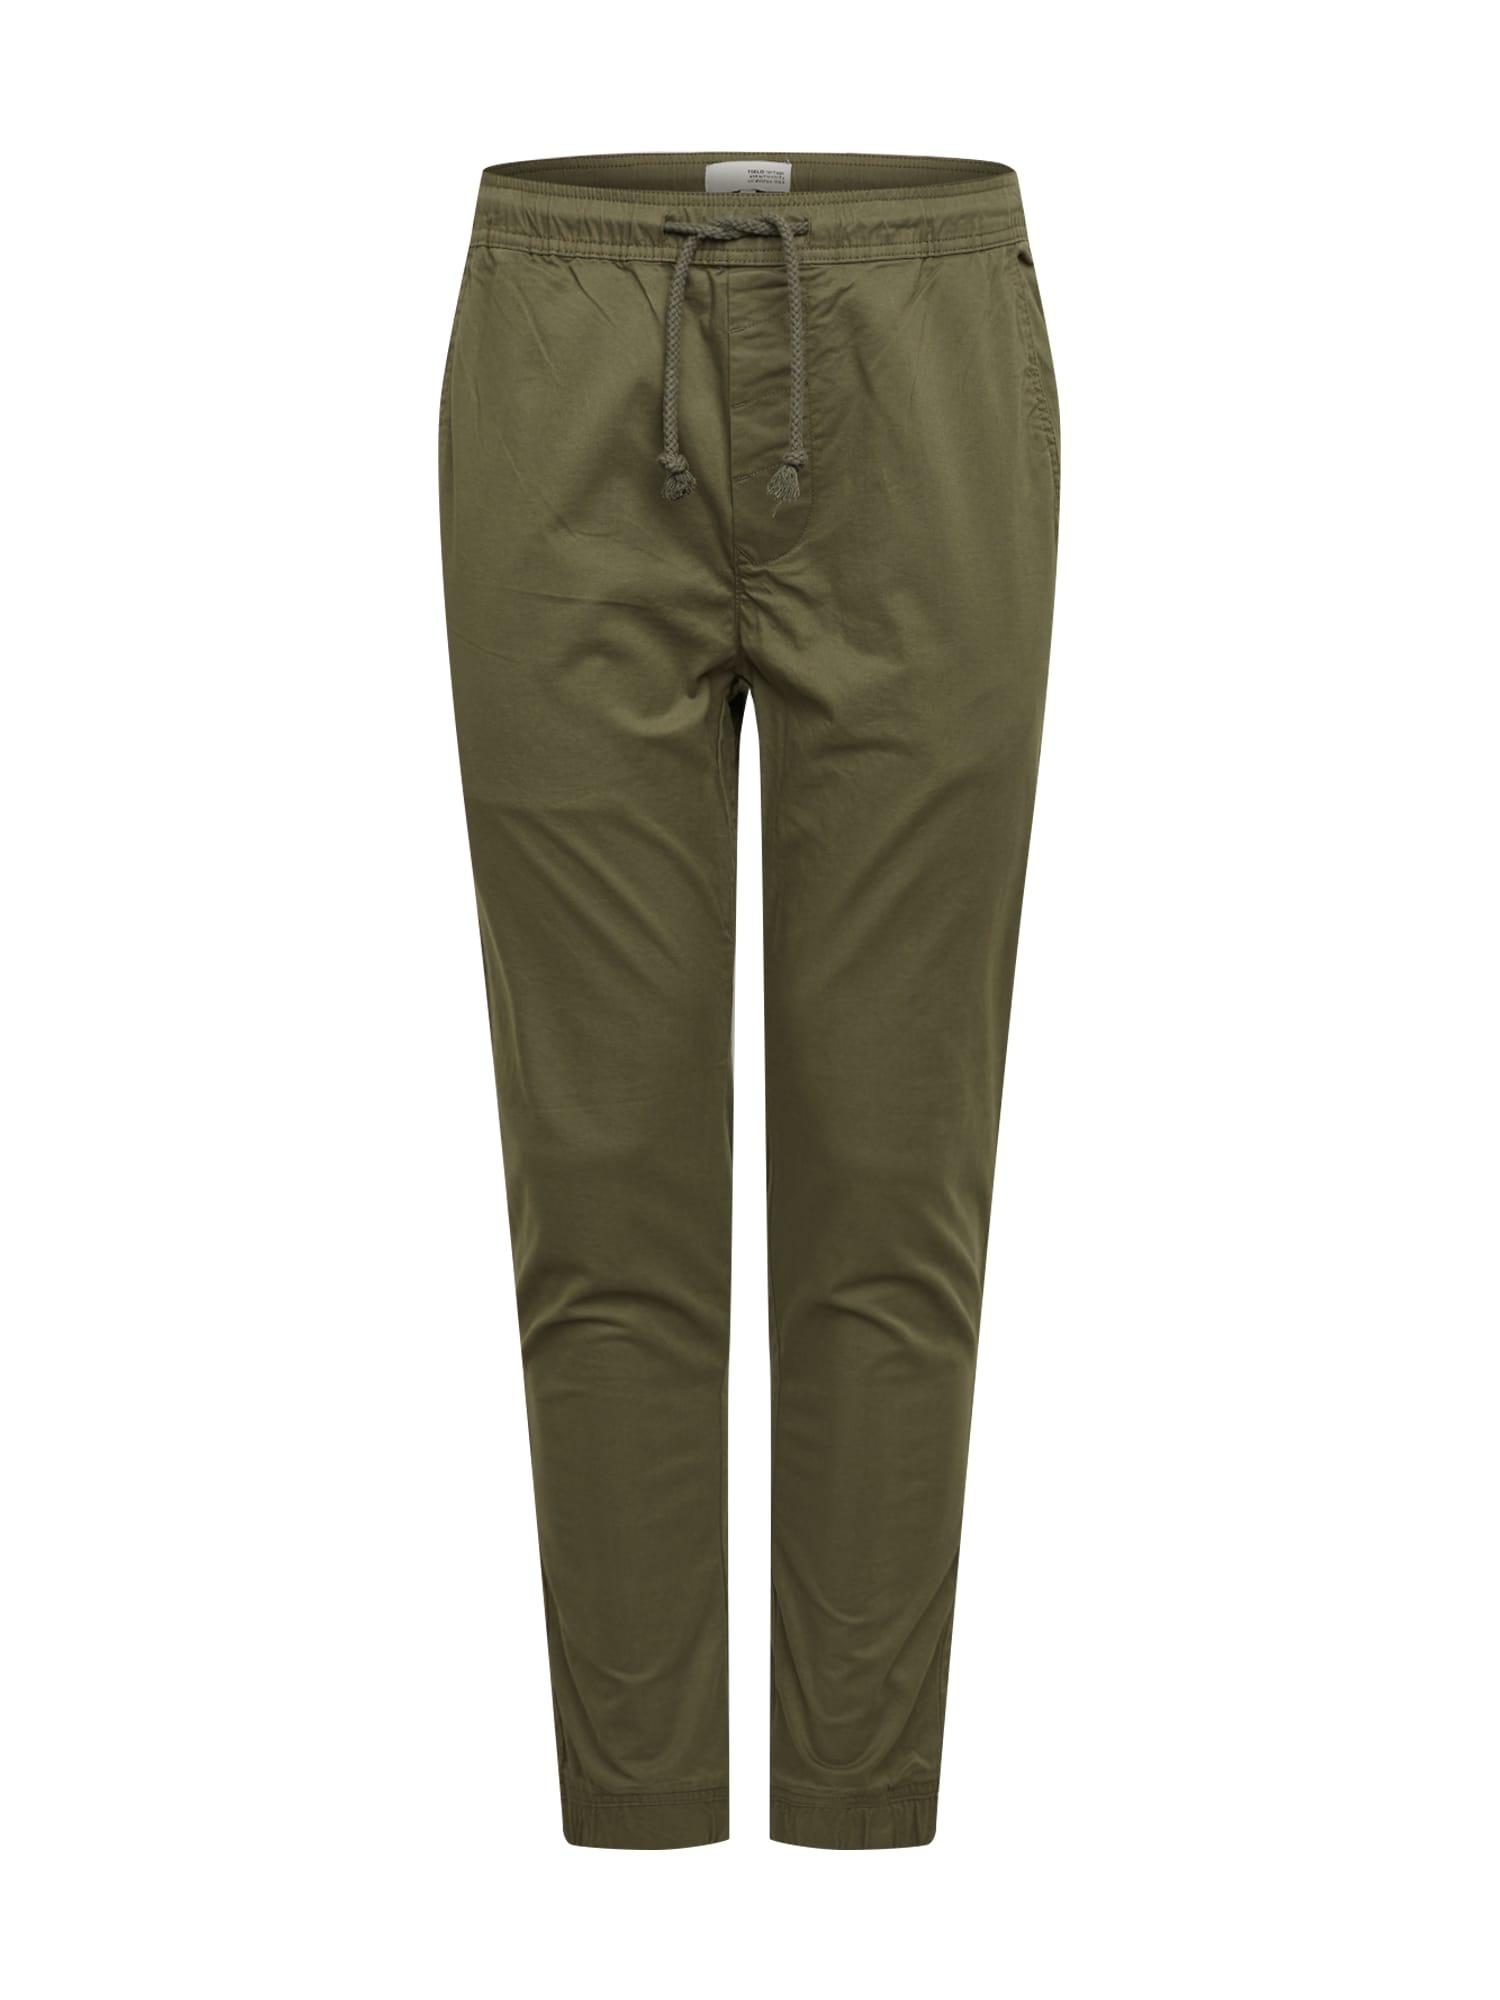 !Solid Pantalon 'Slim-Truc Cuff'  - Vert - Taille: M - male